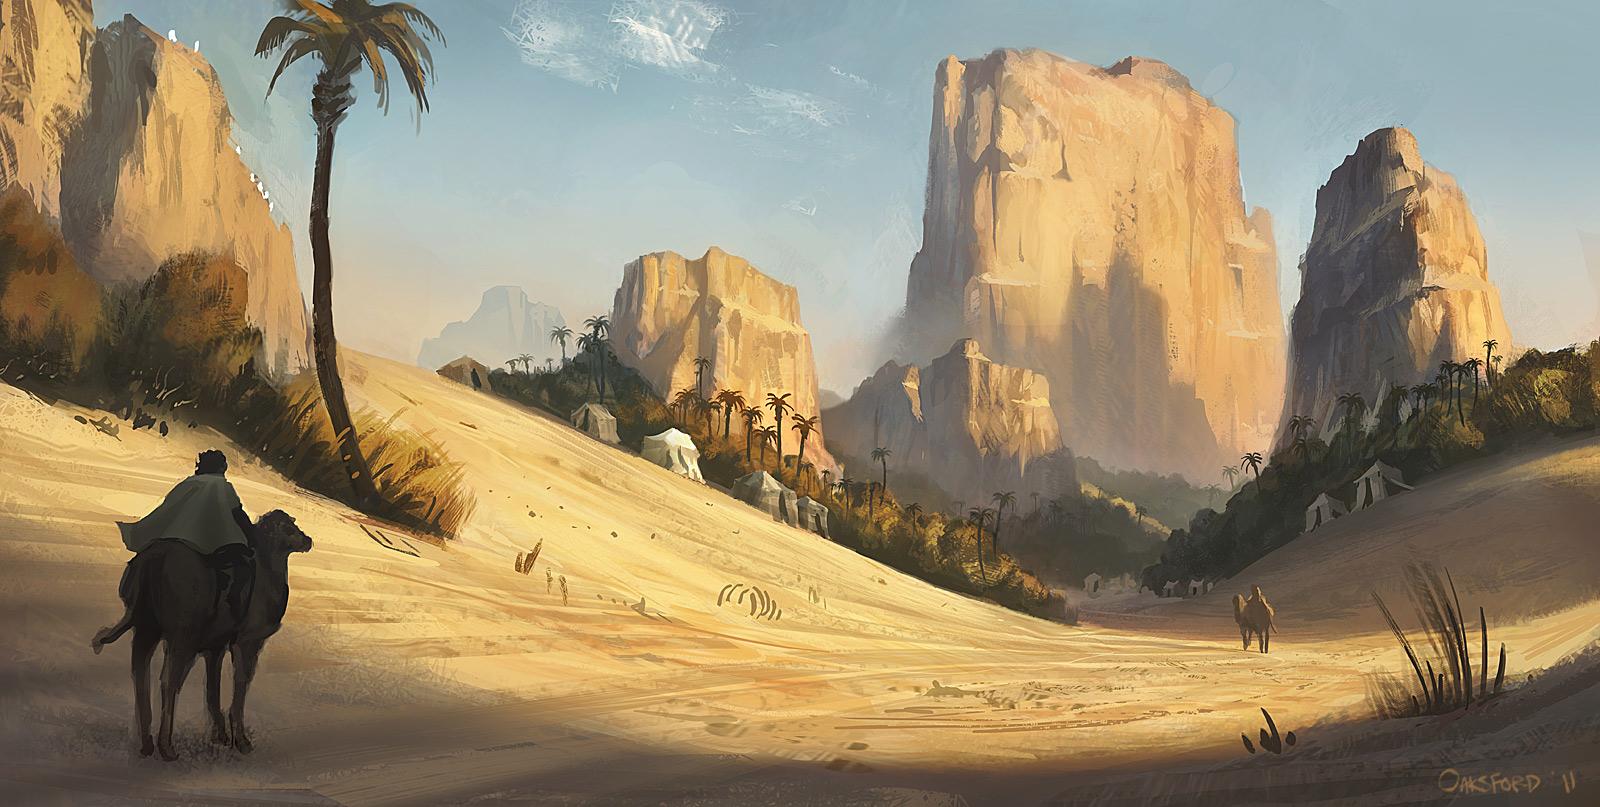 the_al_fayoum_oasis_by_justinoaksford-d49dzf9.jpg